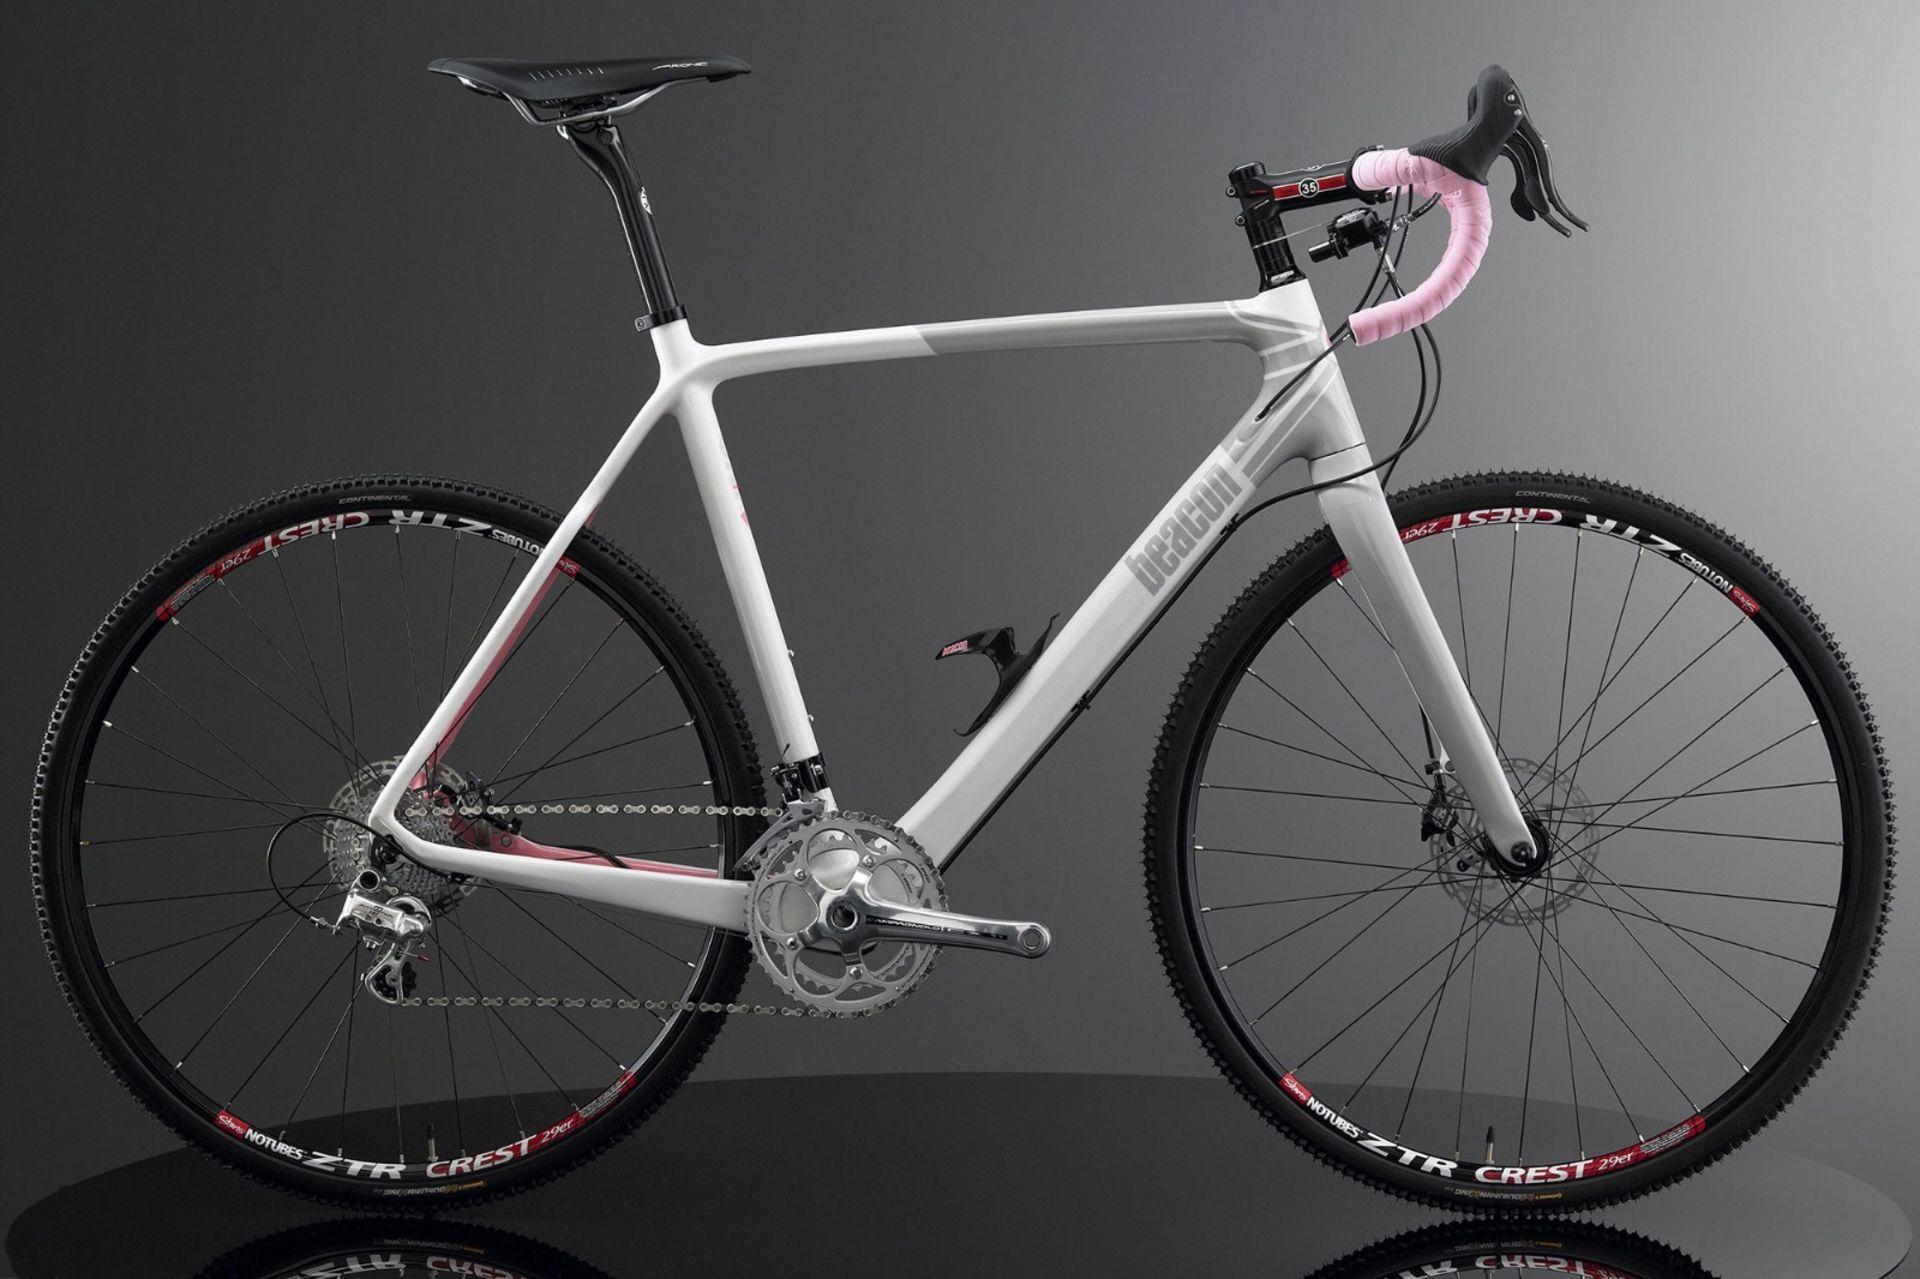 Lot 52 - 1 x Beacon Model BF-45, Size 540, Carbon Fibre Bike Frame in White & Grey.